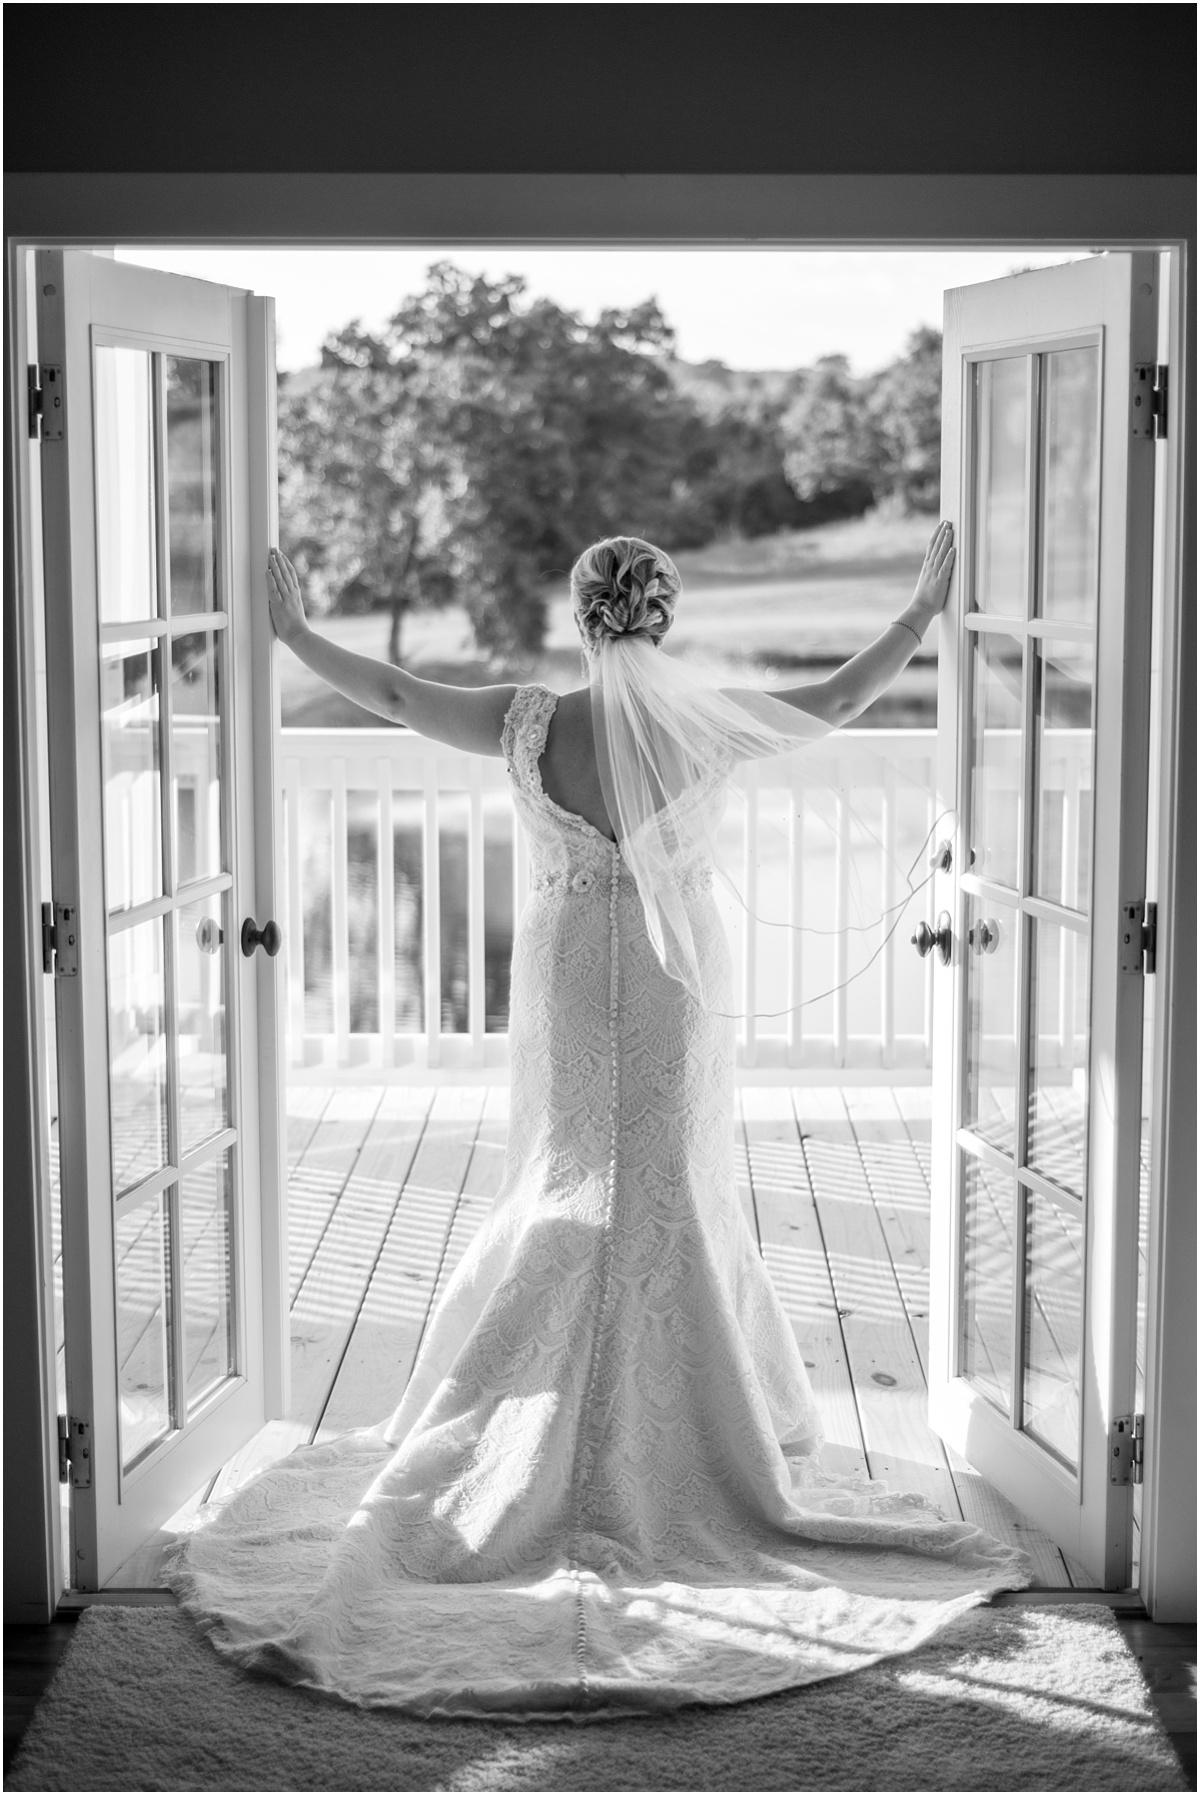 Greg Smit Photography Nashville wedding photographer Mint Springs Farm  12